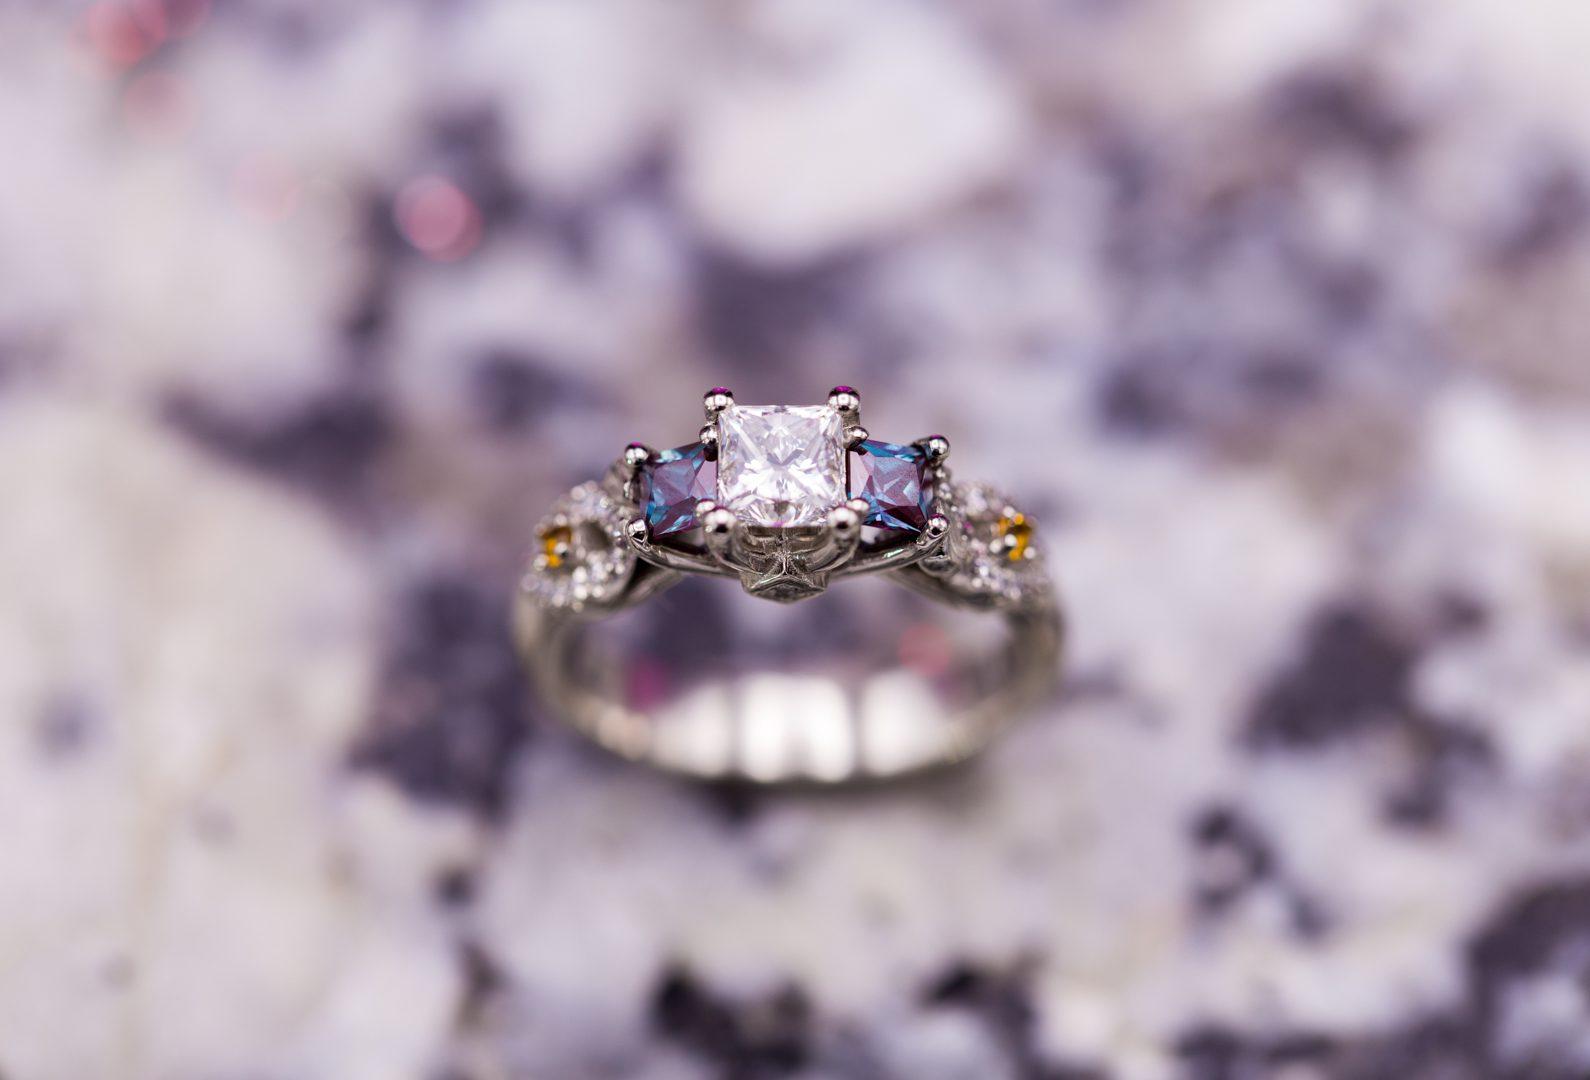 princess-cut diamonds - vintage inspired setting